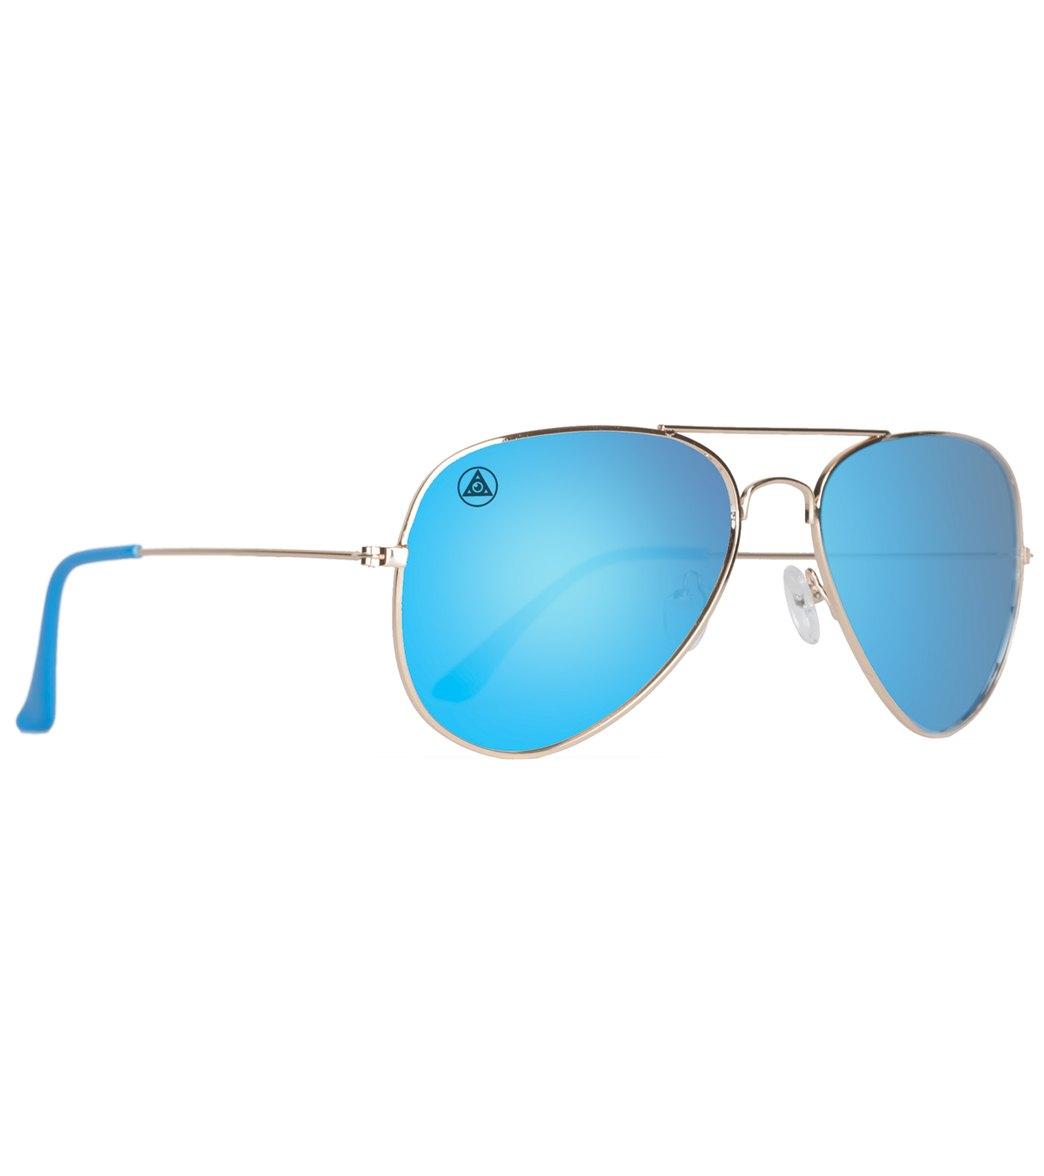 645984fef50 Blenders Blue Angel Sunglasses at SwimOutlet.com